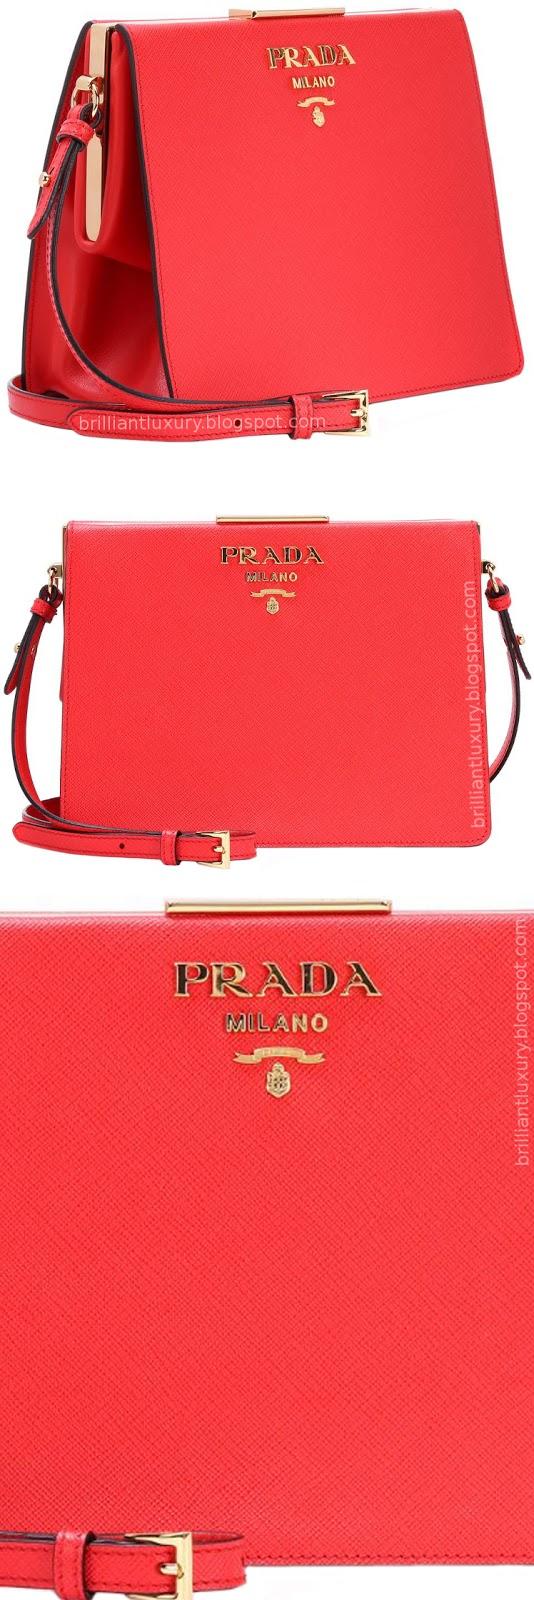 Brilliant Luxury ♦ Prada Saffiano red leather shoulder bag